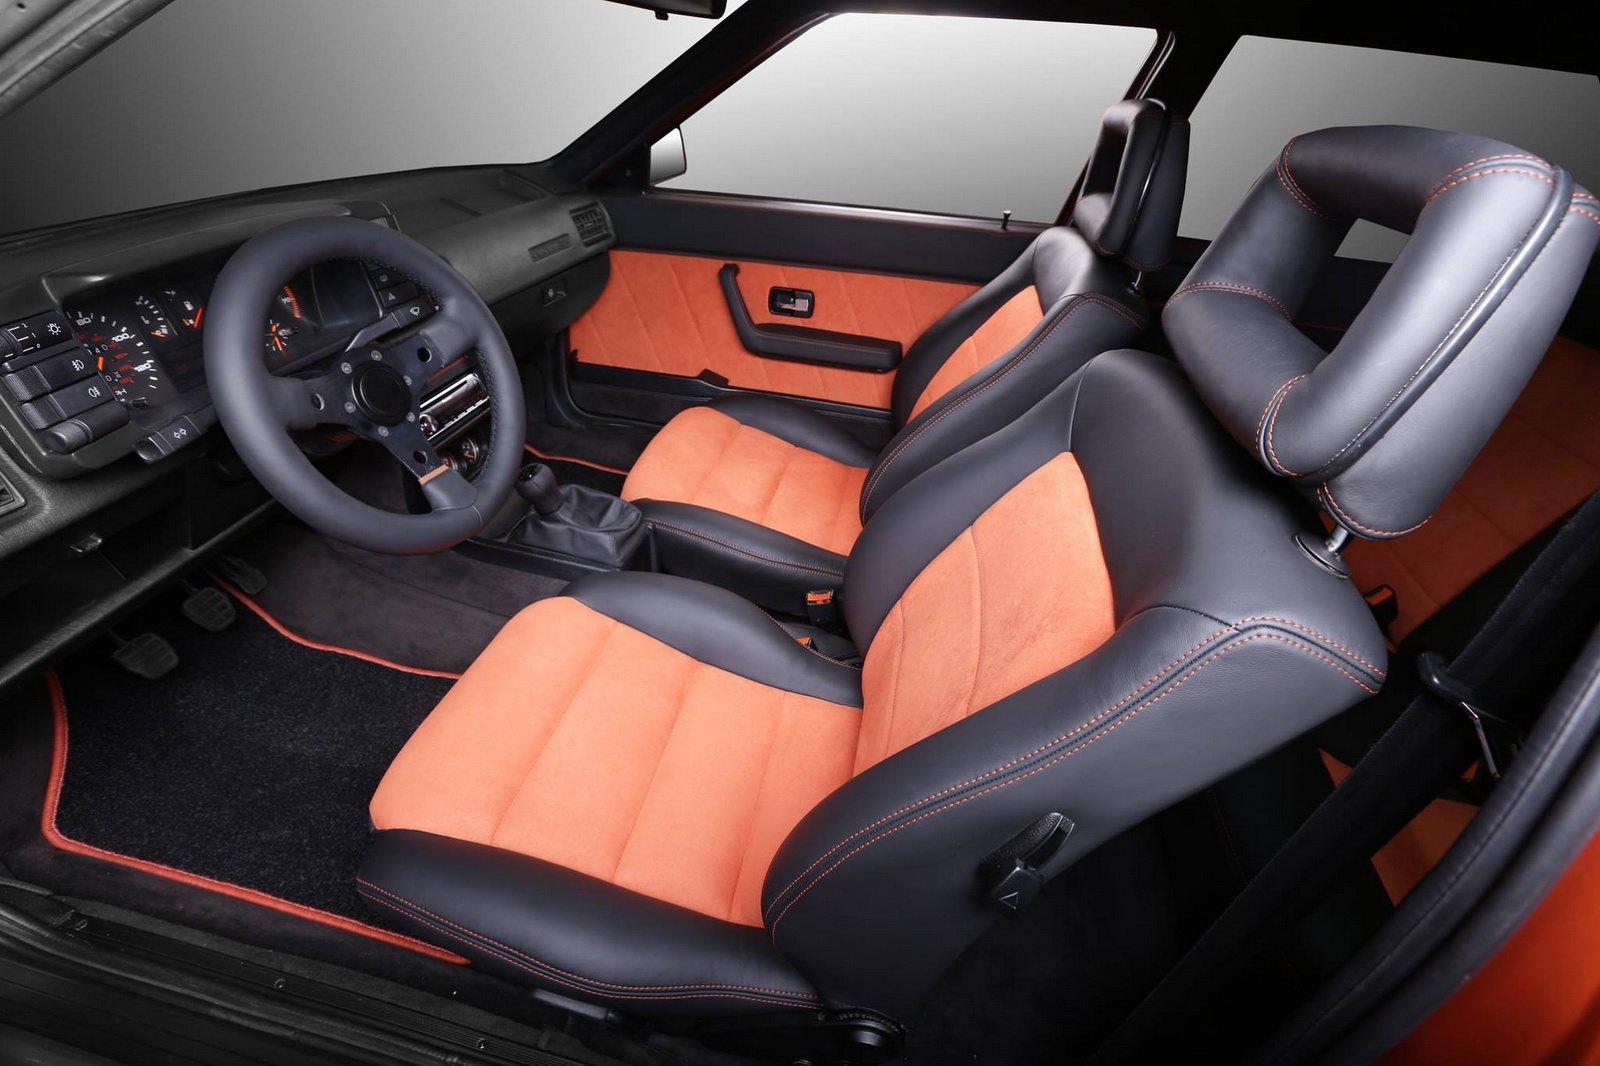 1477150904 audi coupe 18 - Carbon Motors преобразили интерьер Audi B2